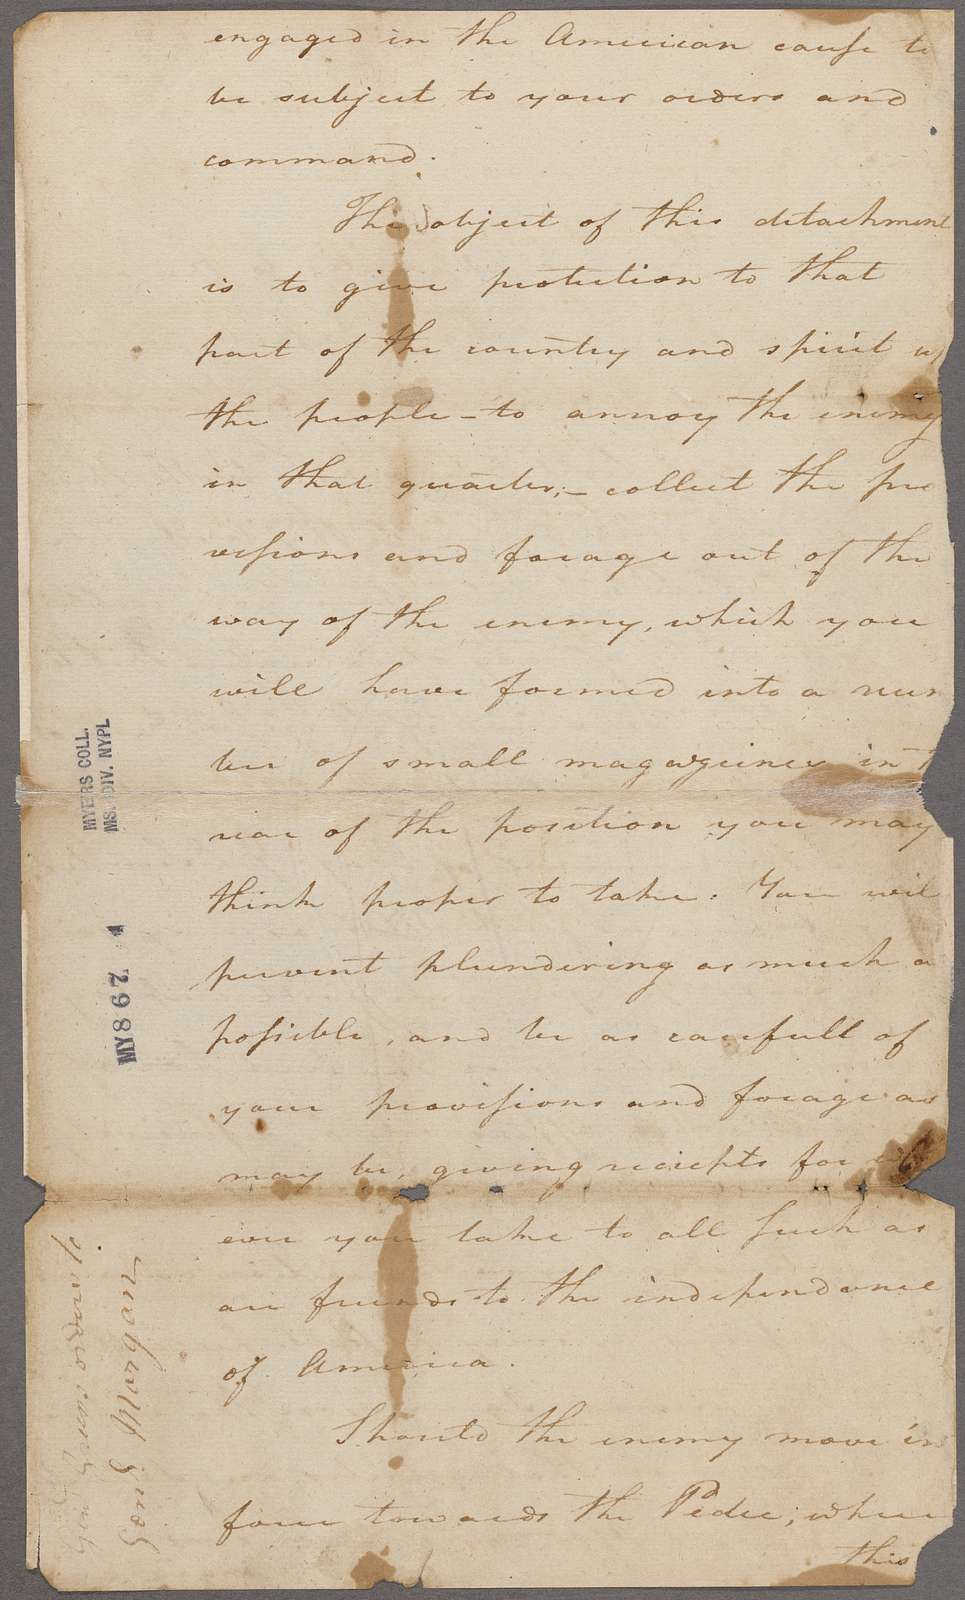 Greene, Nathanael. Charlotte. To General Morgan